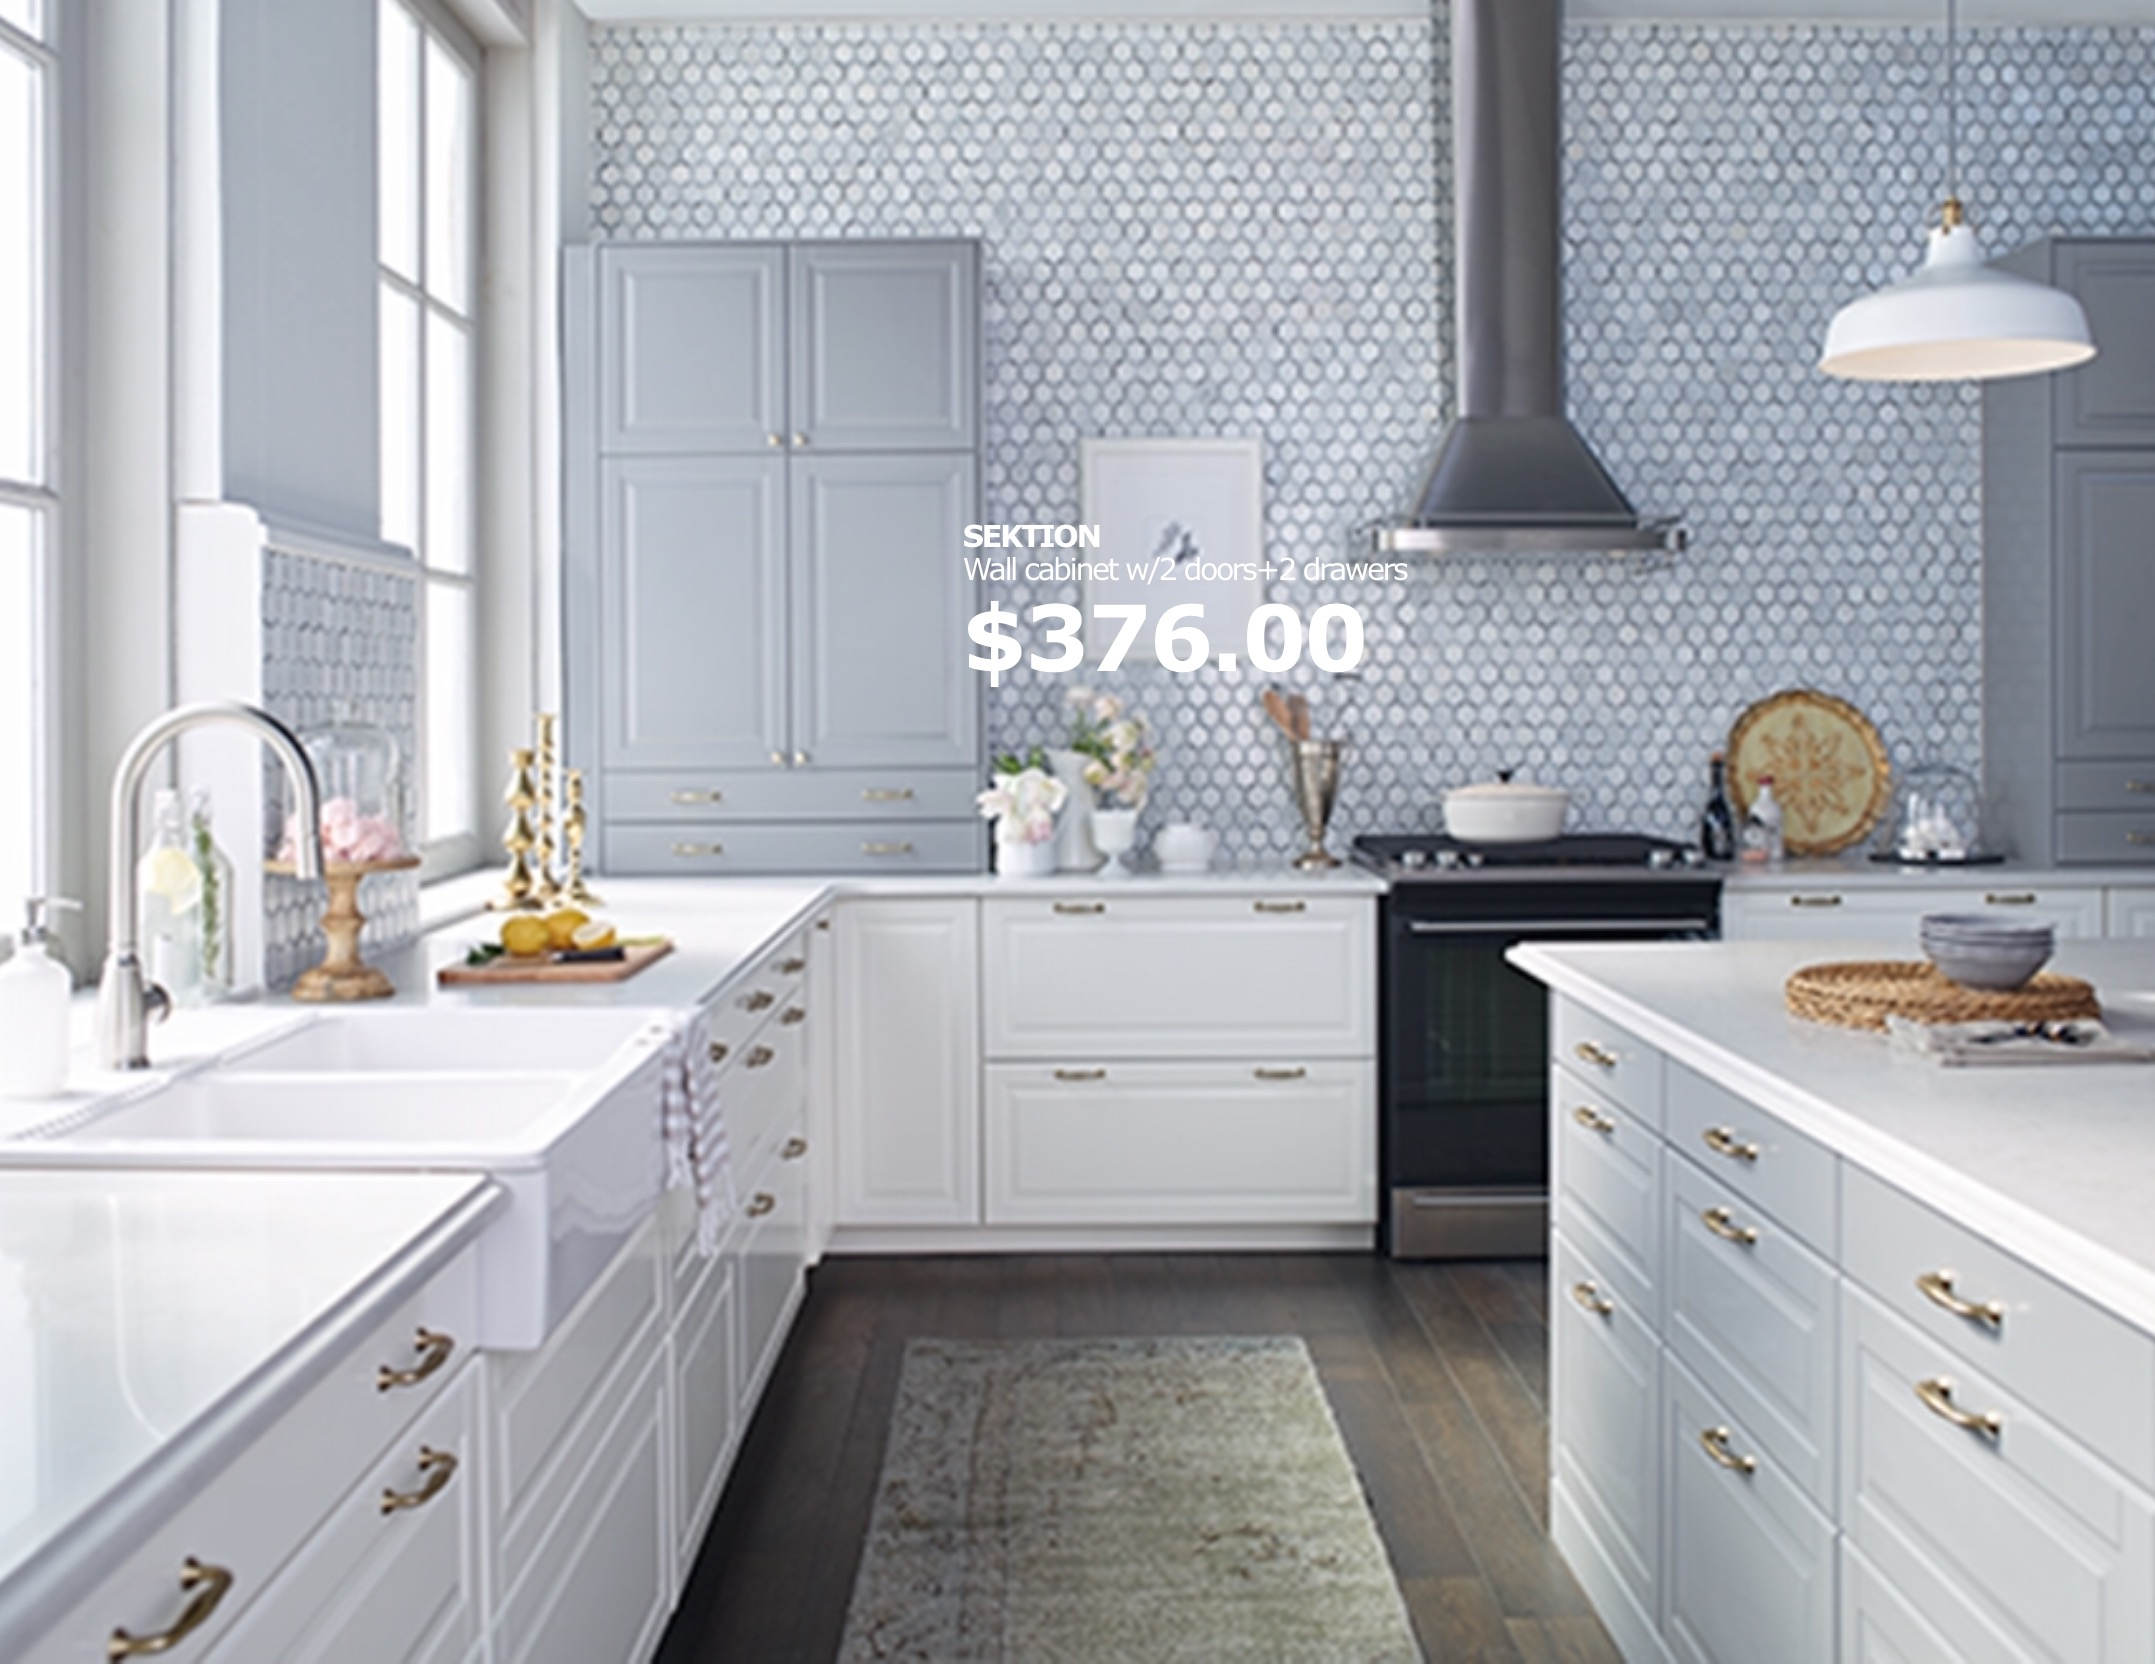 Designing Your Dream Kitchen - Tabella Talks